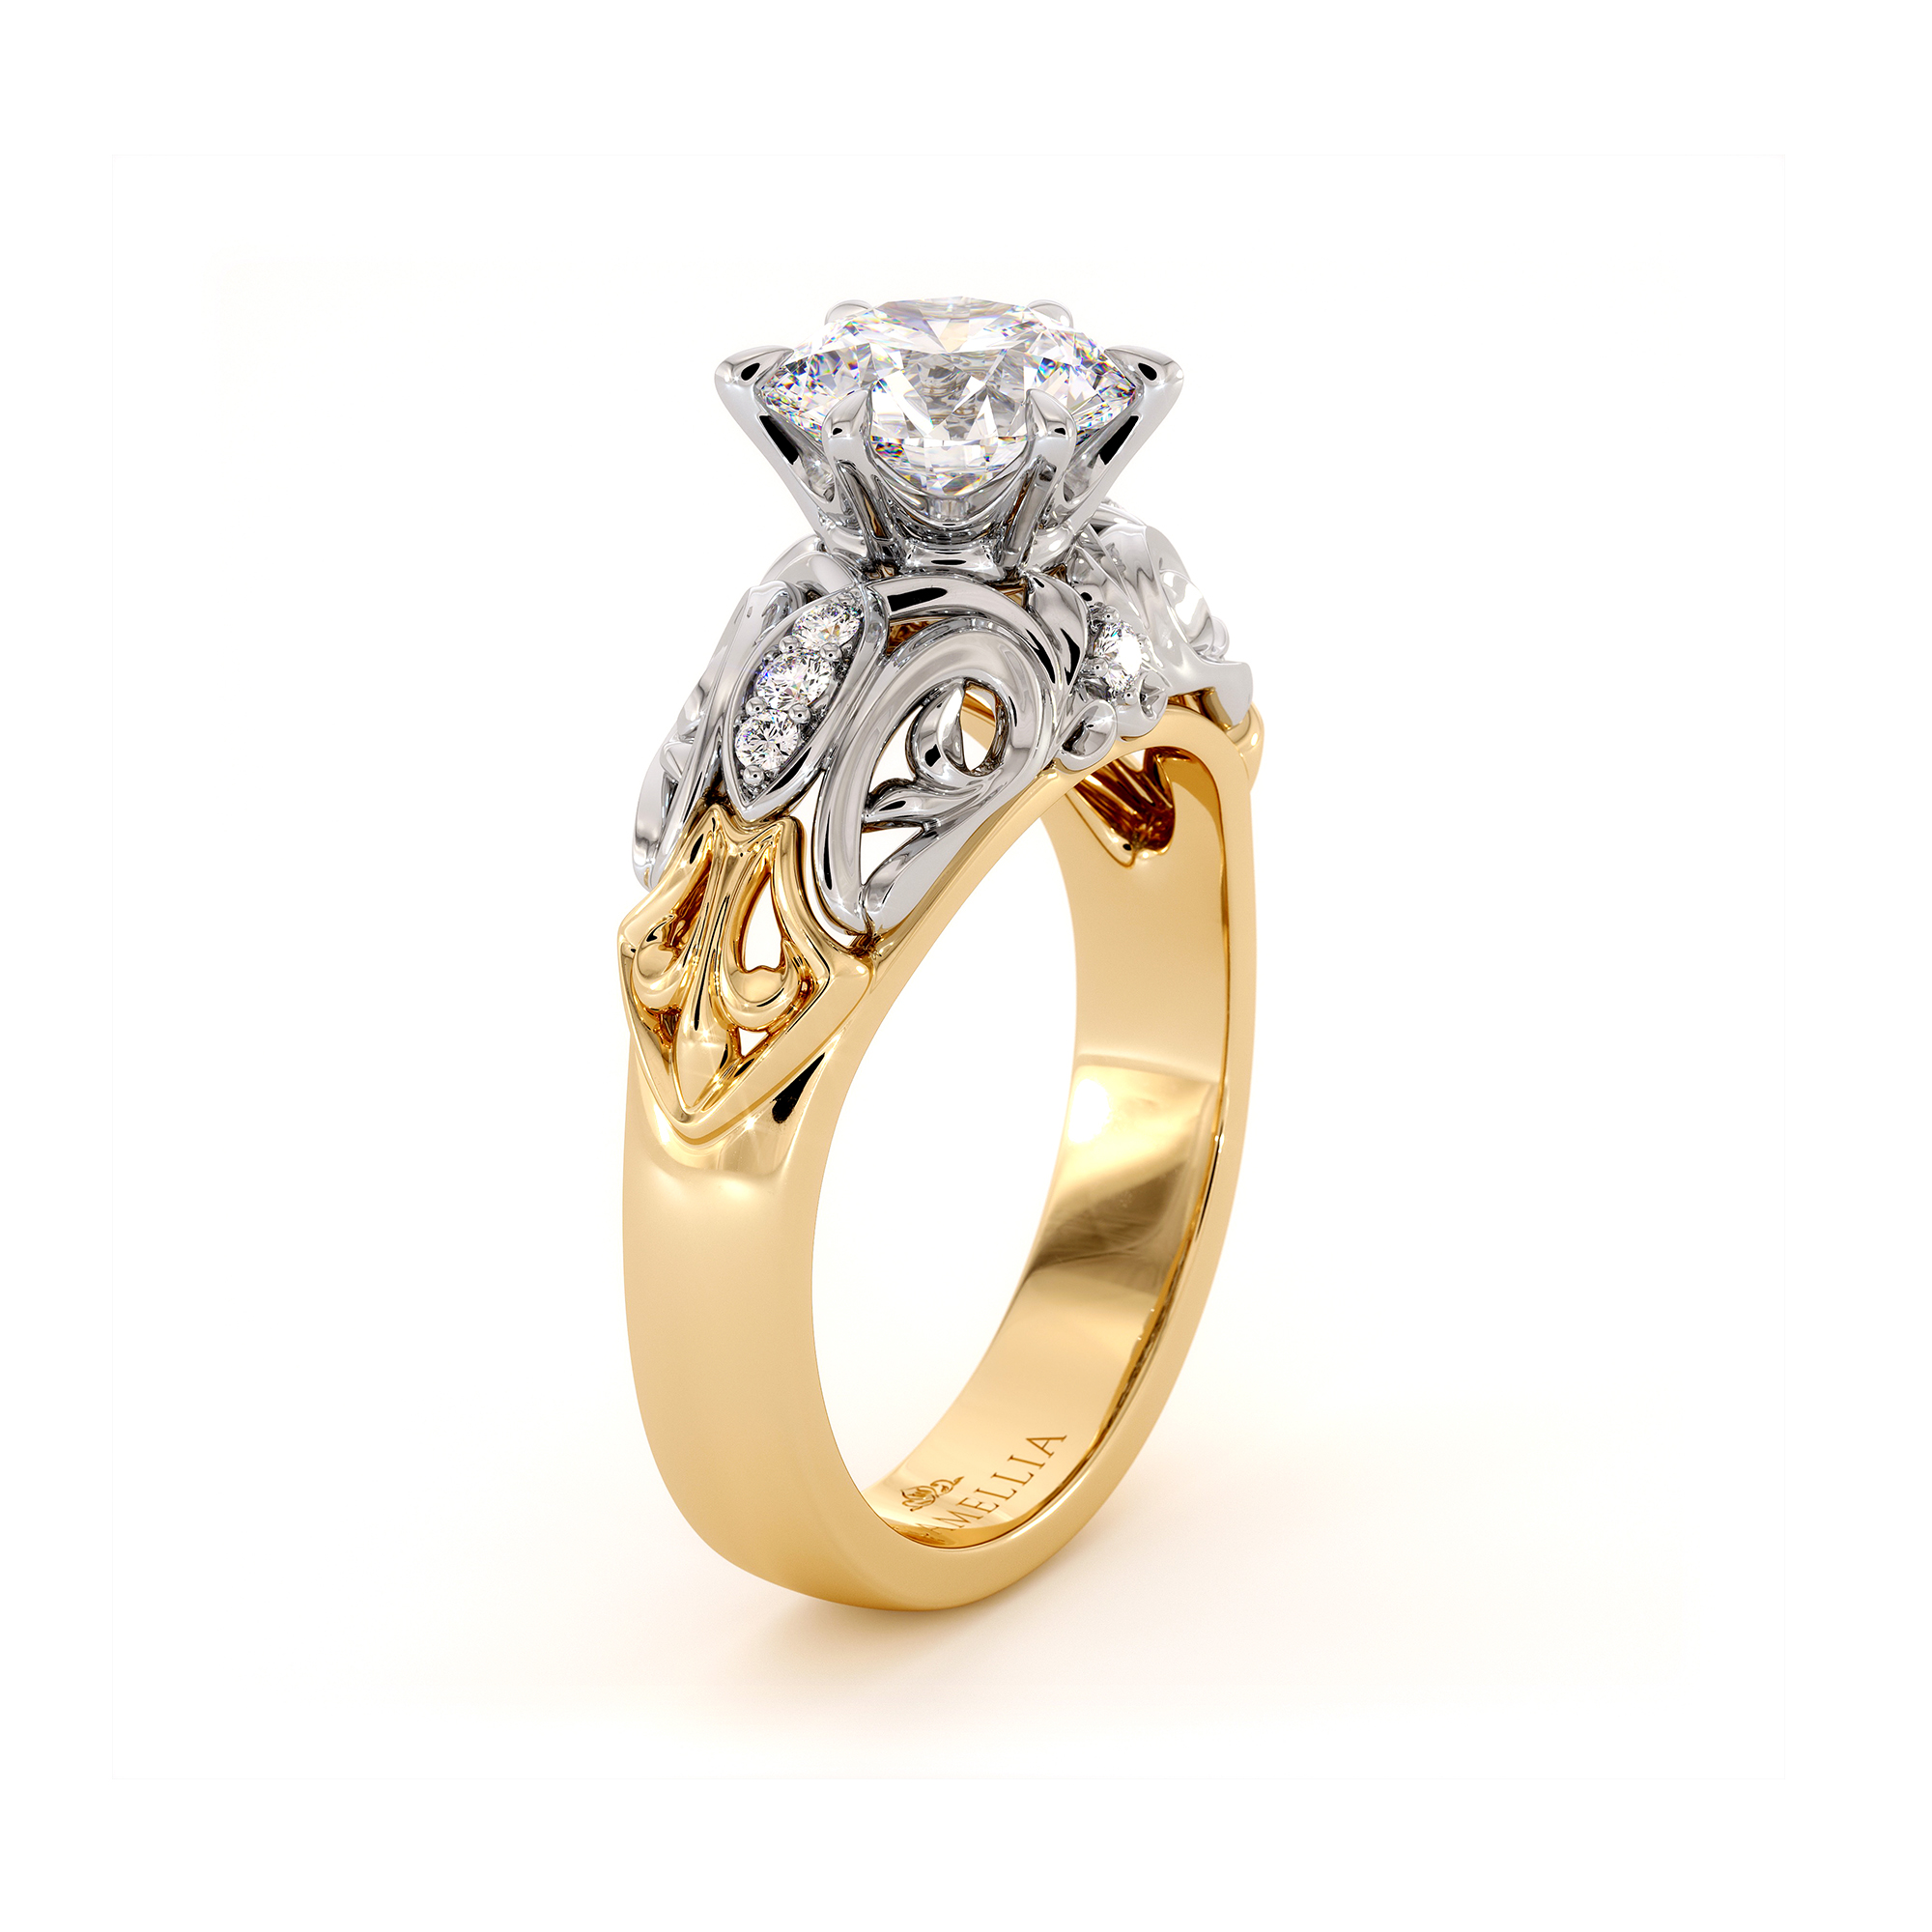 Royal Filigree 1.55 Ct FO Moissanite Engagement Ring